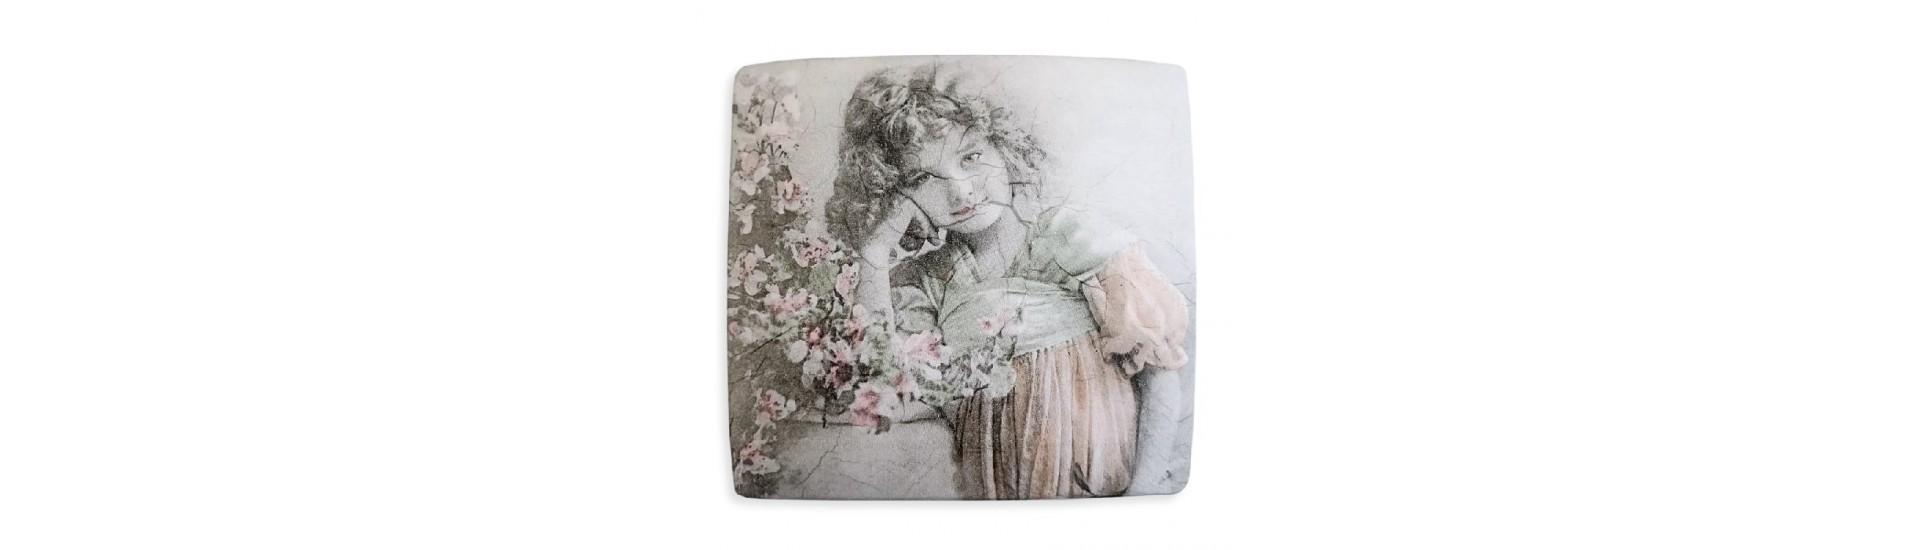 "Магнит для штор на тросе Д-3 Декупаж ""Девочка и ваза с цветами"" 14,5 см Квадрат"